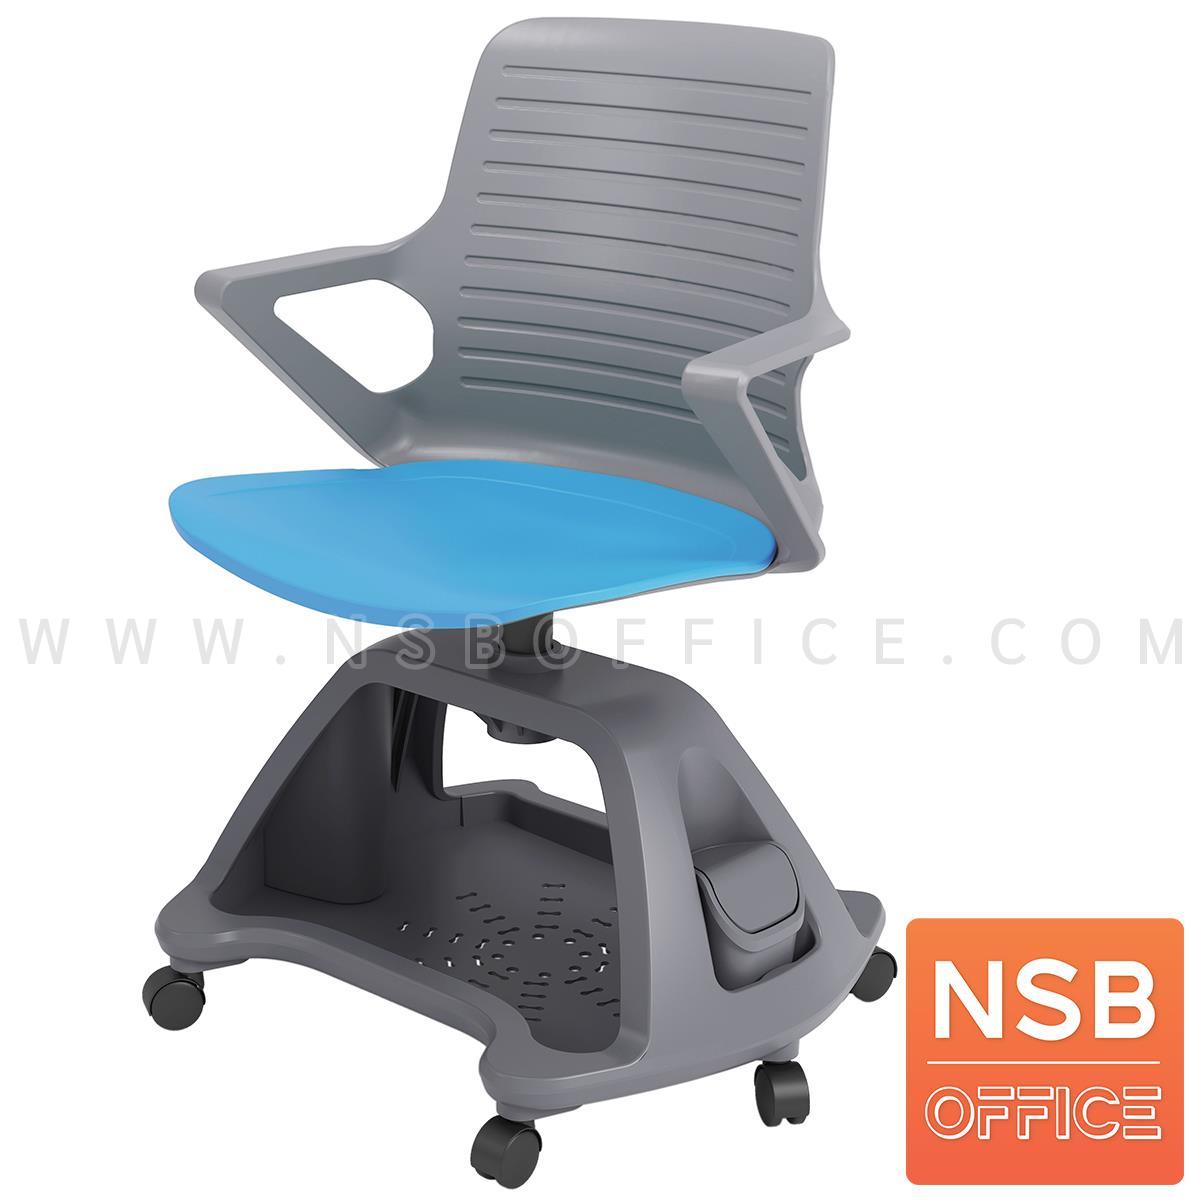 B30A053:เก้าอี้เฟรมโพลี่ล้อเลื่อน รุ่น Rhine (ไรน์) วางกระเป๋าได้